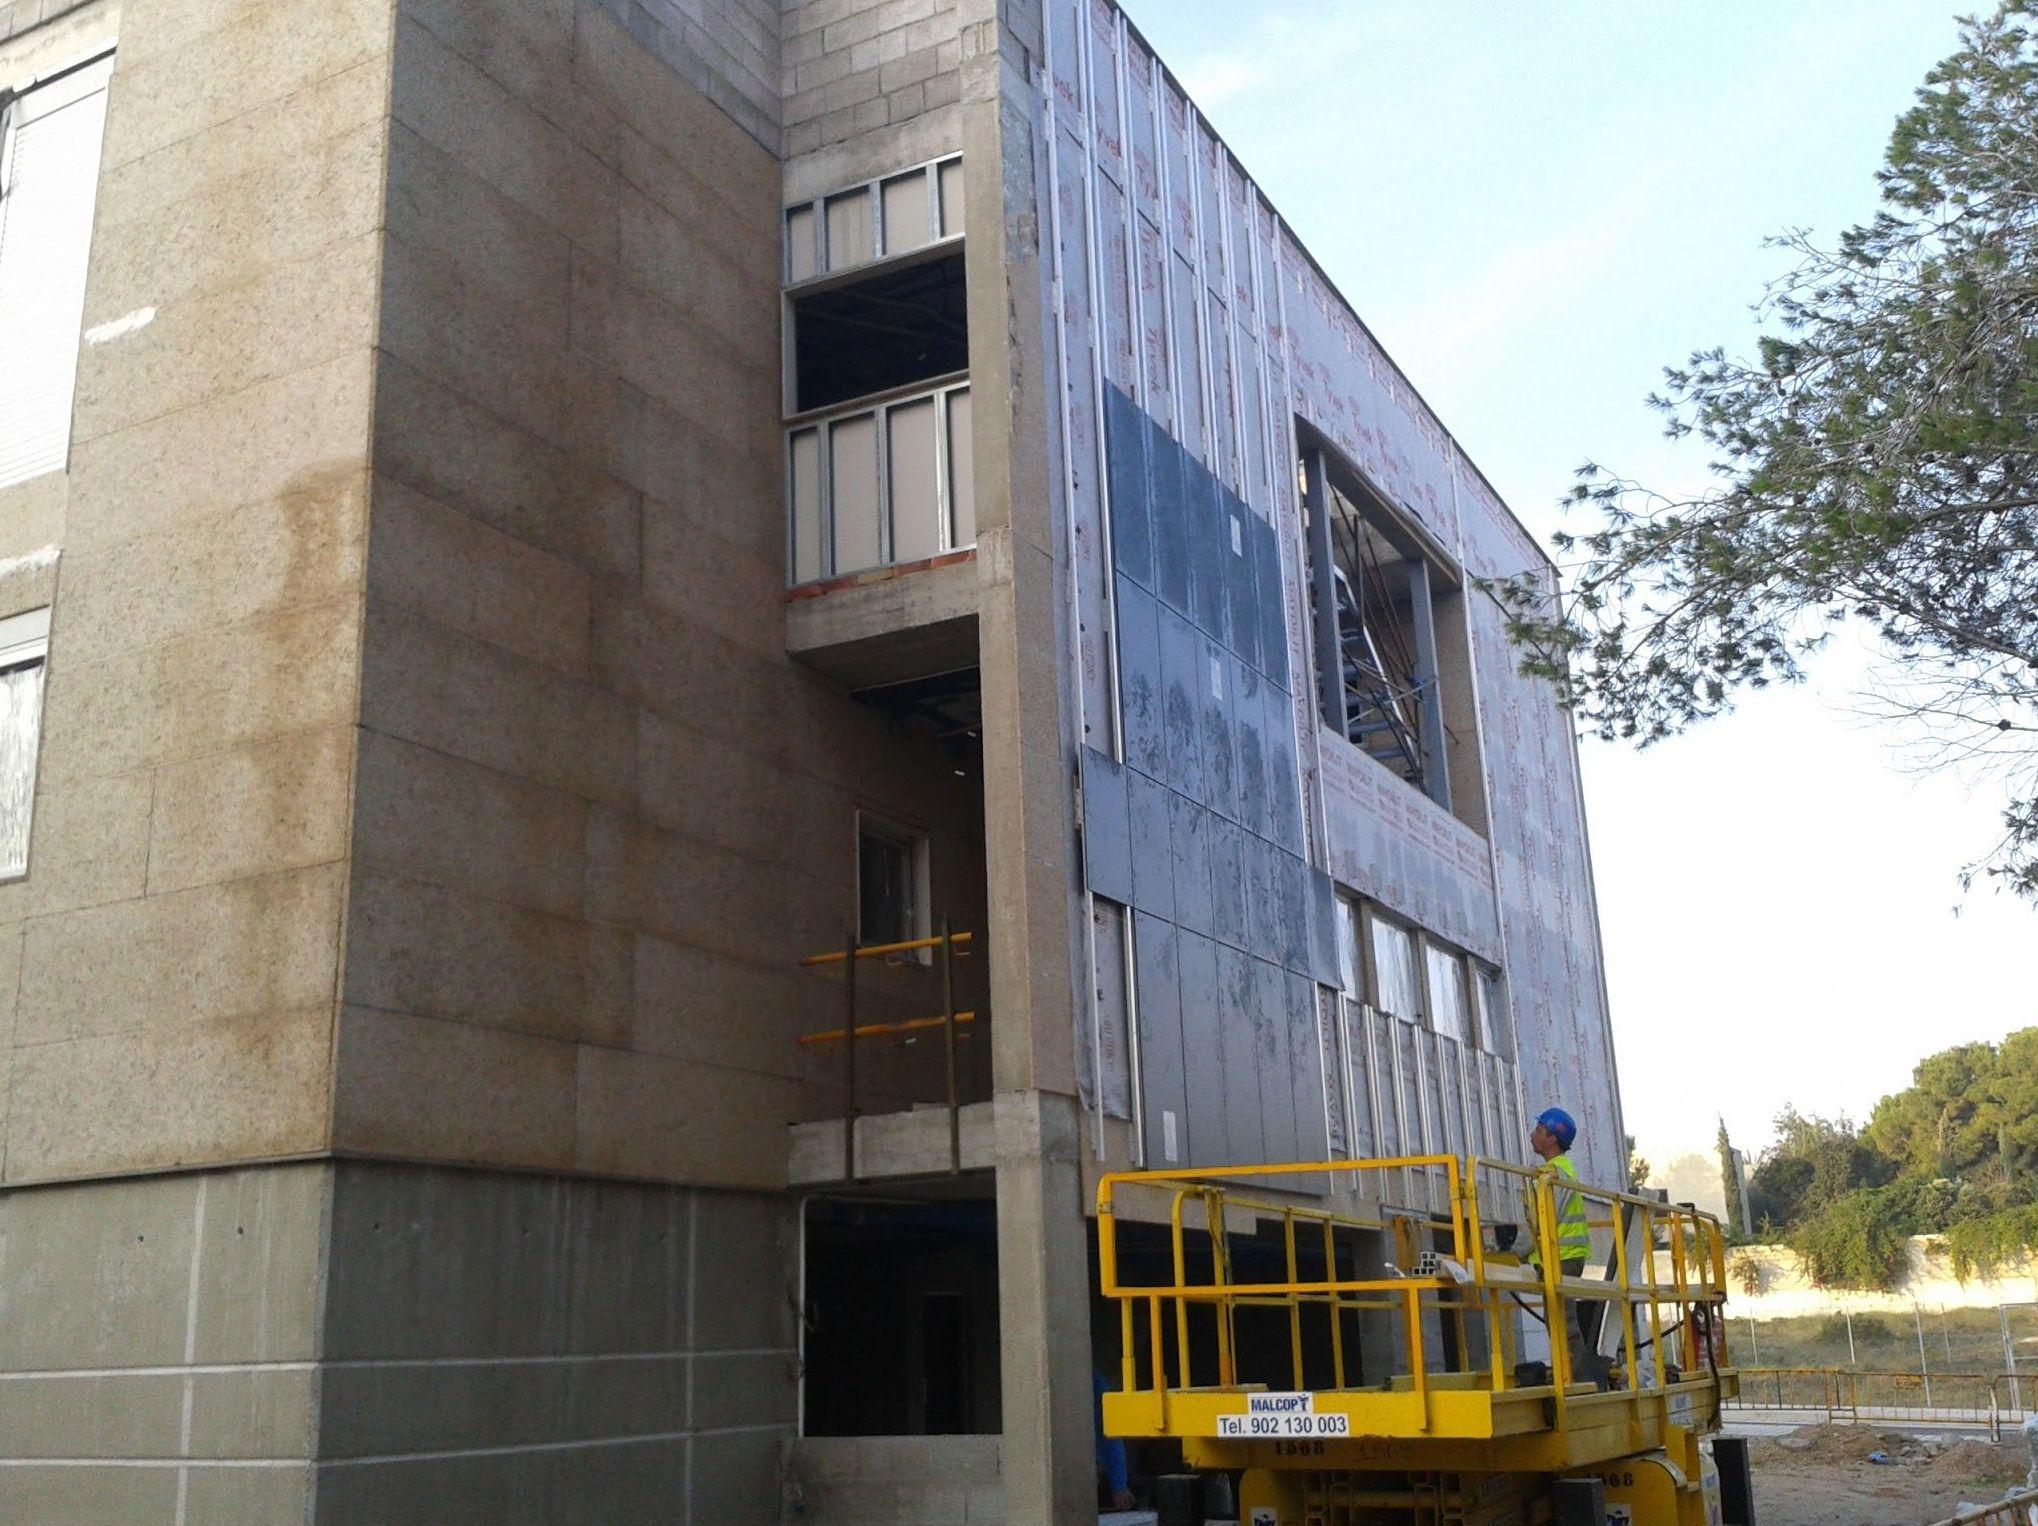 Cerramientos exteriores de obra seca. Fase 2 - Panelado exterior e interior de la estructura